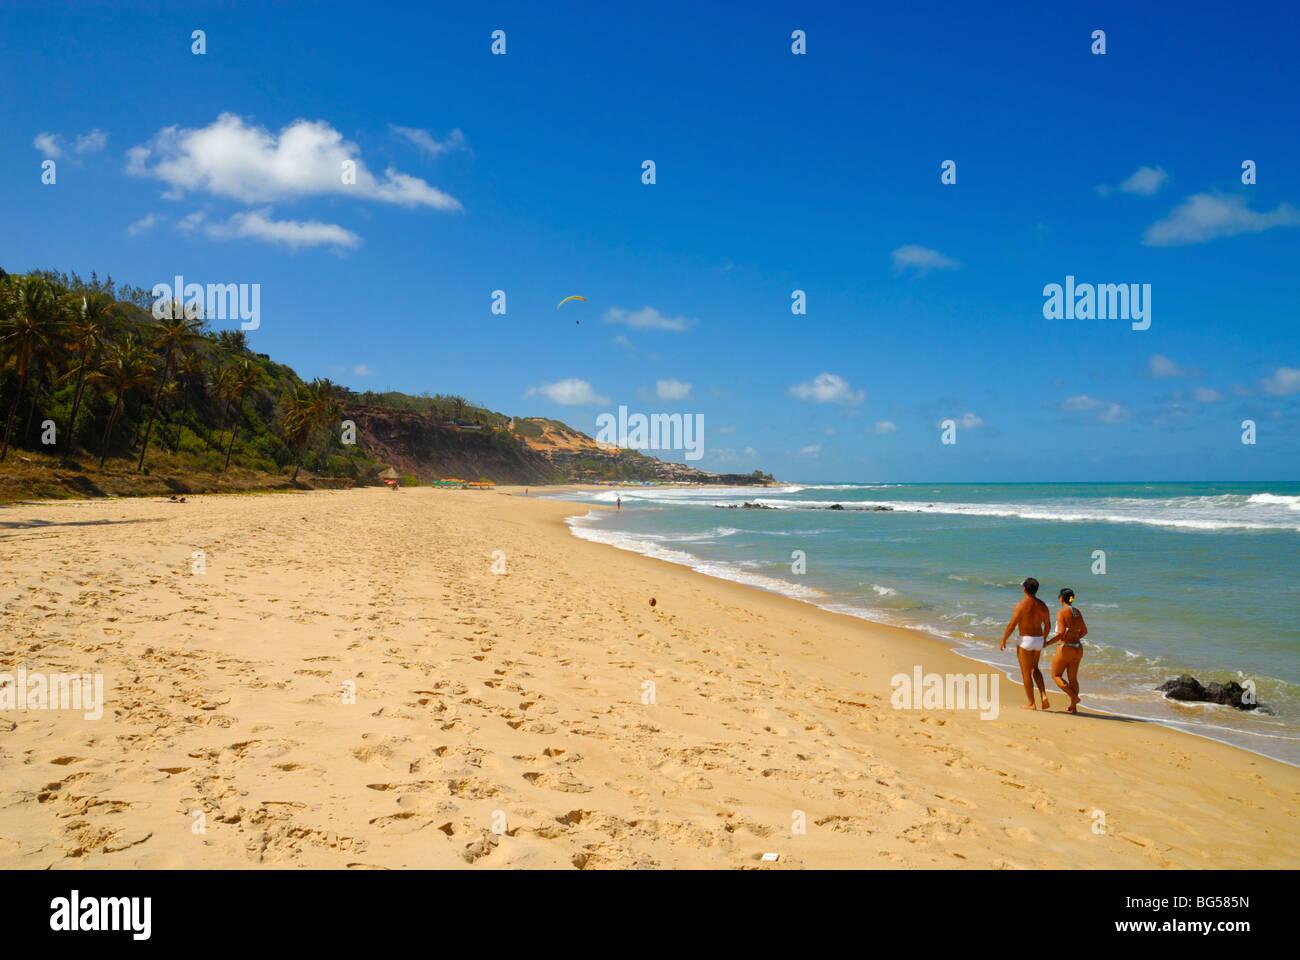 La gente caminando por la hermosa playa de Praia do Amor cerca de Pipa Brasil Imagen De Stock